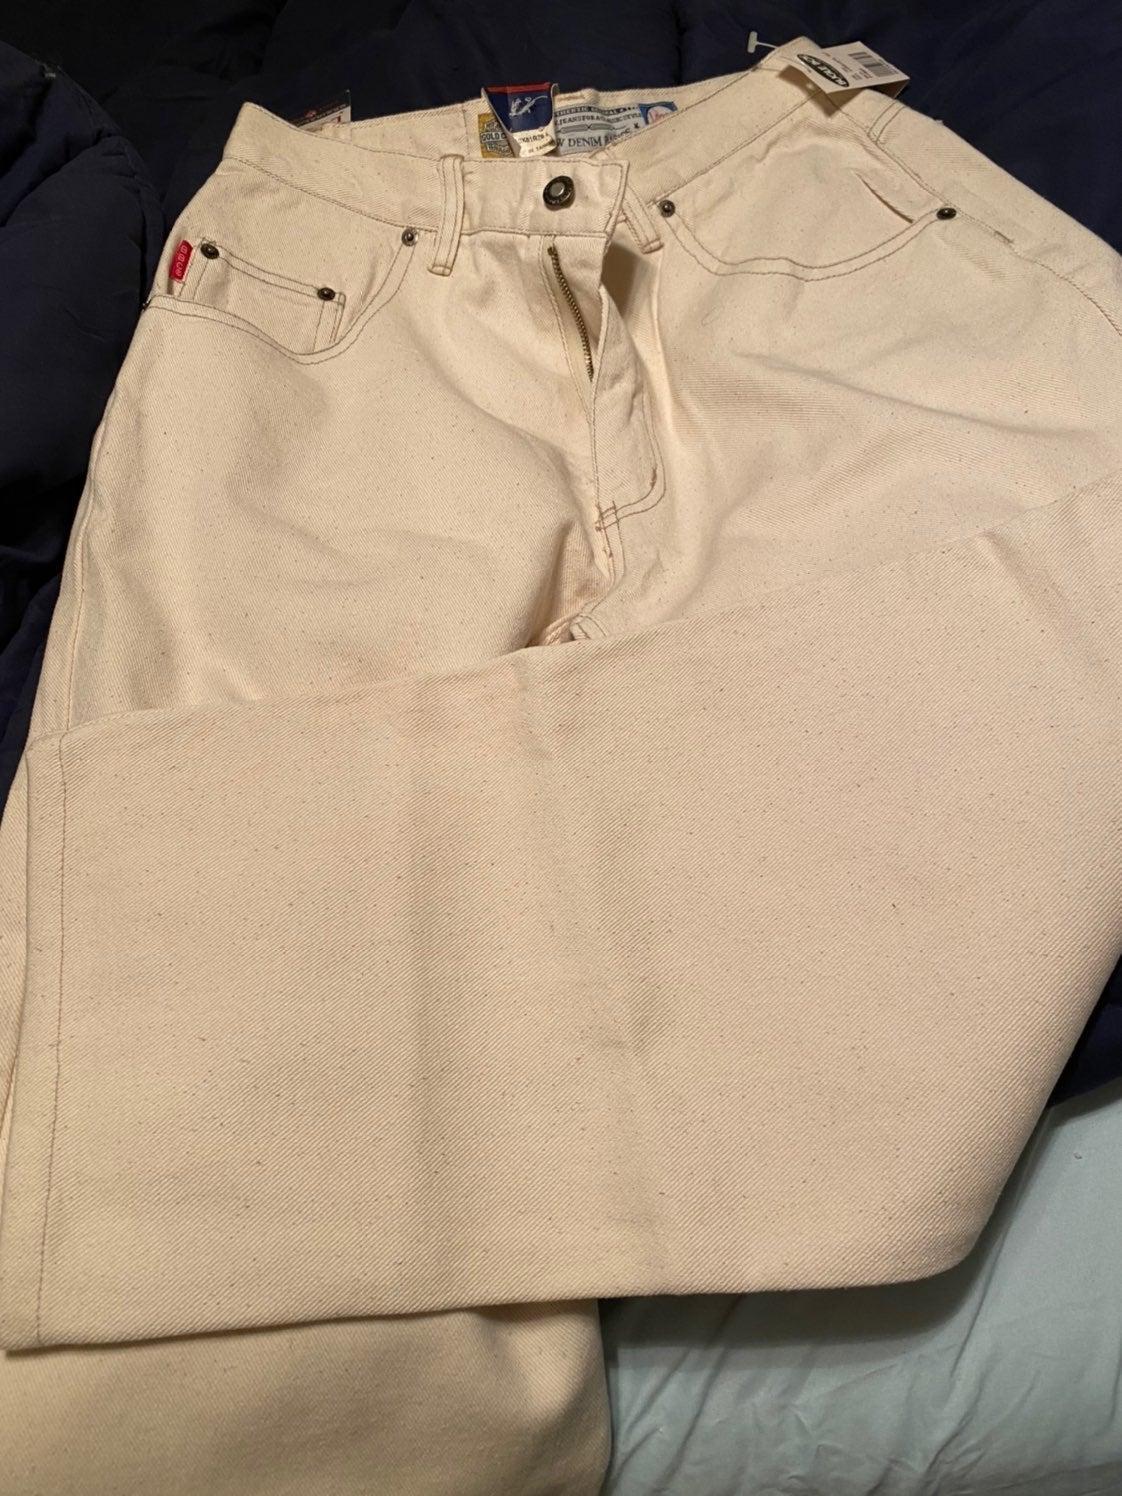 Mens Deadstock Vintage Bugle Boy Jeans